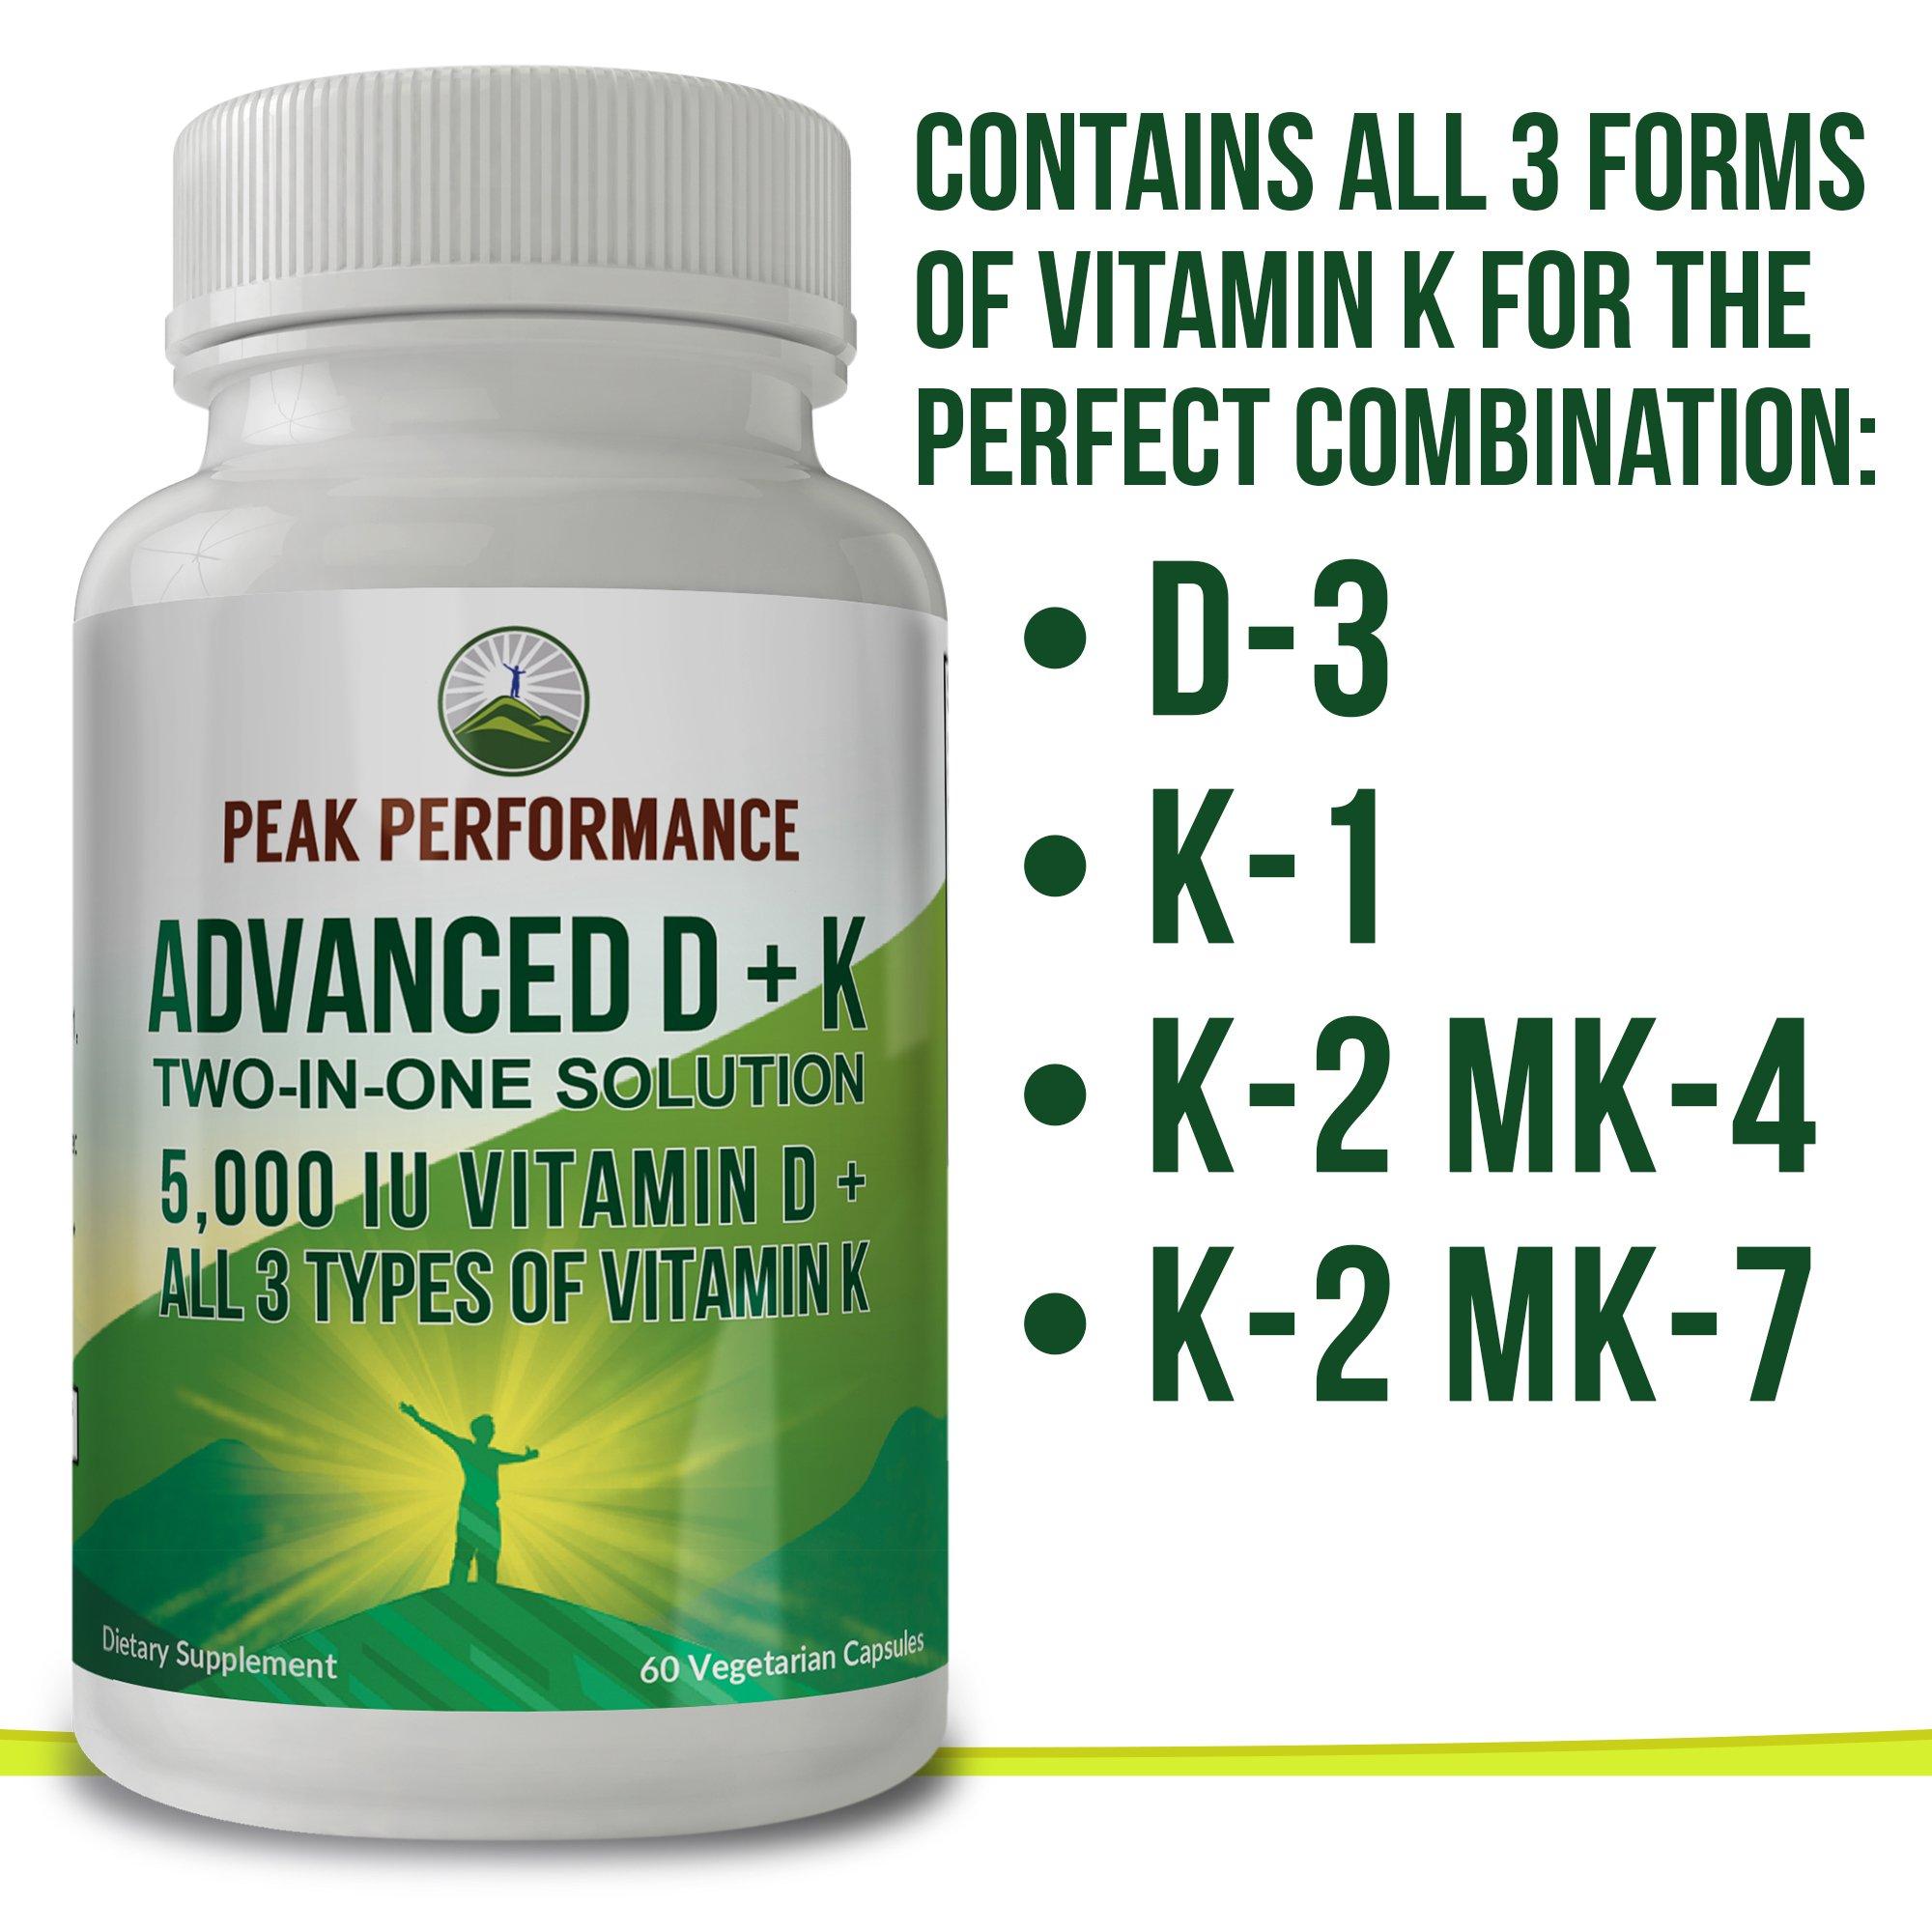 ADVANCED Vitamin D 5000 IU + ALL 3 Types Of Vitamin K By Peak Performance. Vitamin D3 and Vitamin K2 MK-7 (MK7) K2 MK4 K1 Supplement! 60 Small & Easy to Swallow Vegetable Capsules / Pills (5000 IU) by Peak Performance Coffee (Image #9)